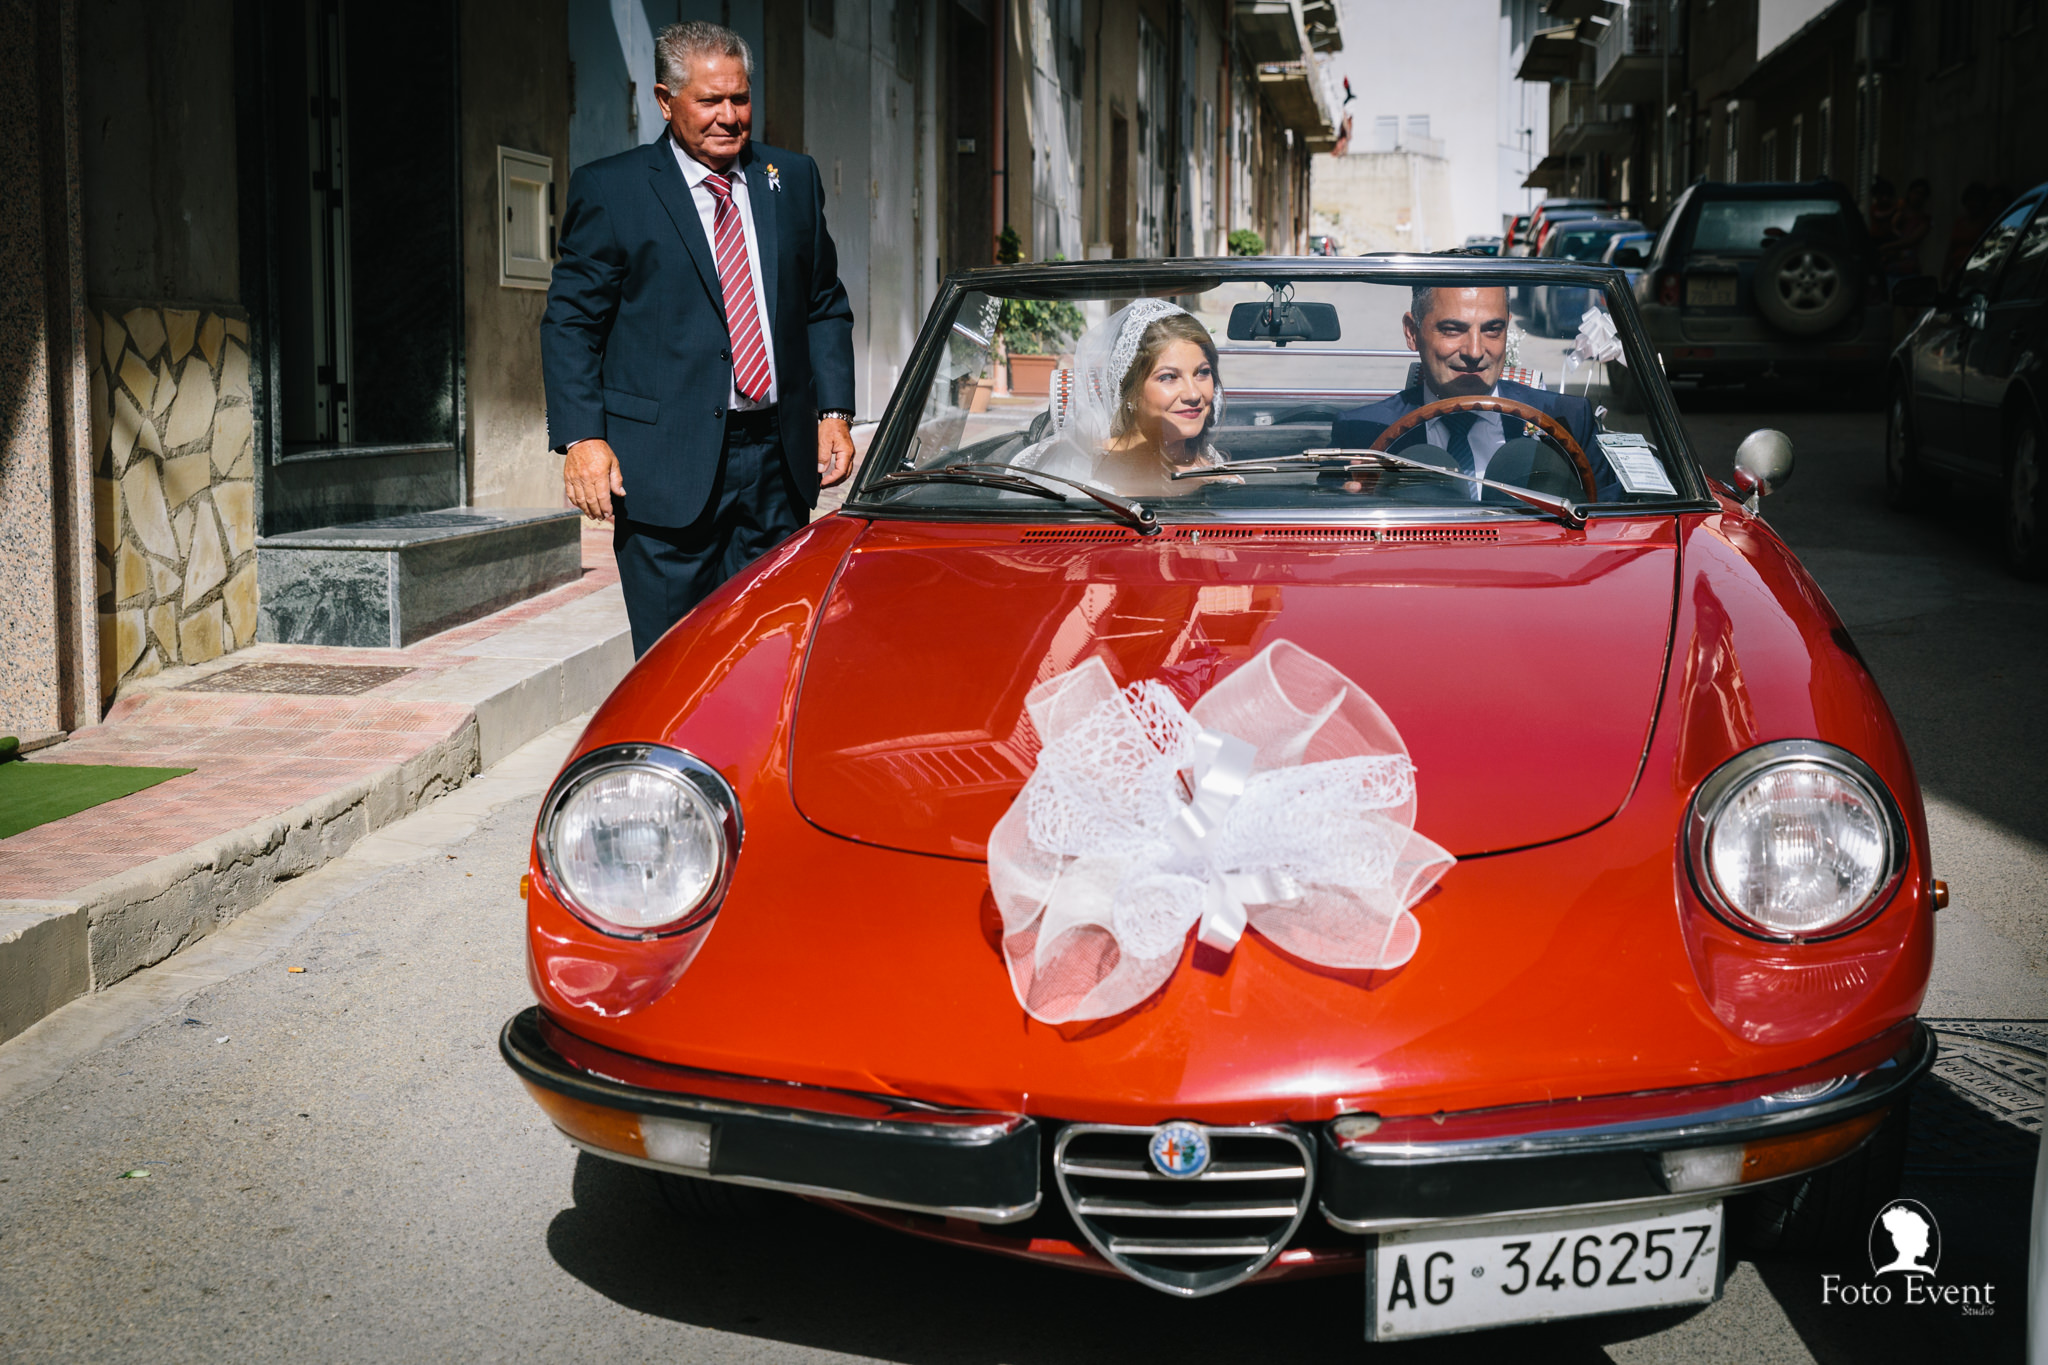 017-2019-06-12-Matrimonio-Rosa-e-Angelo-Ripellino-5DE-811